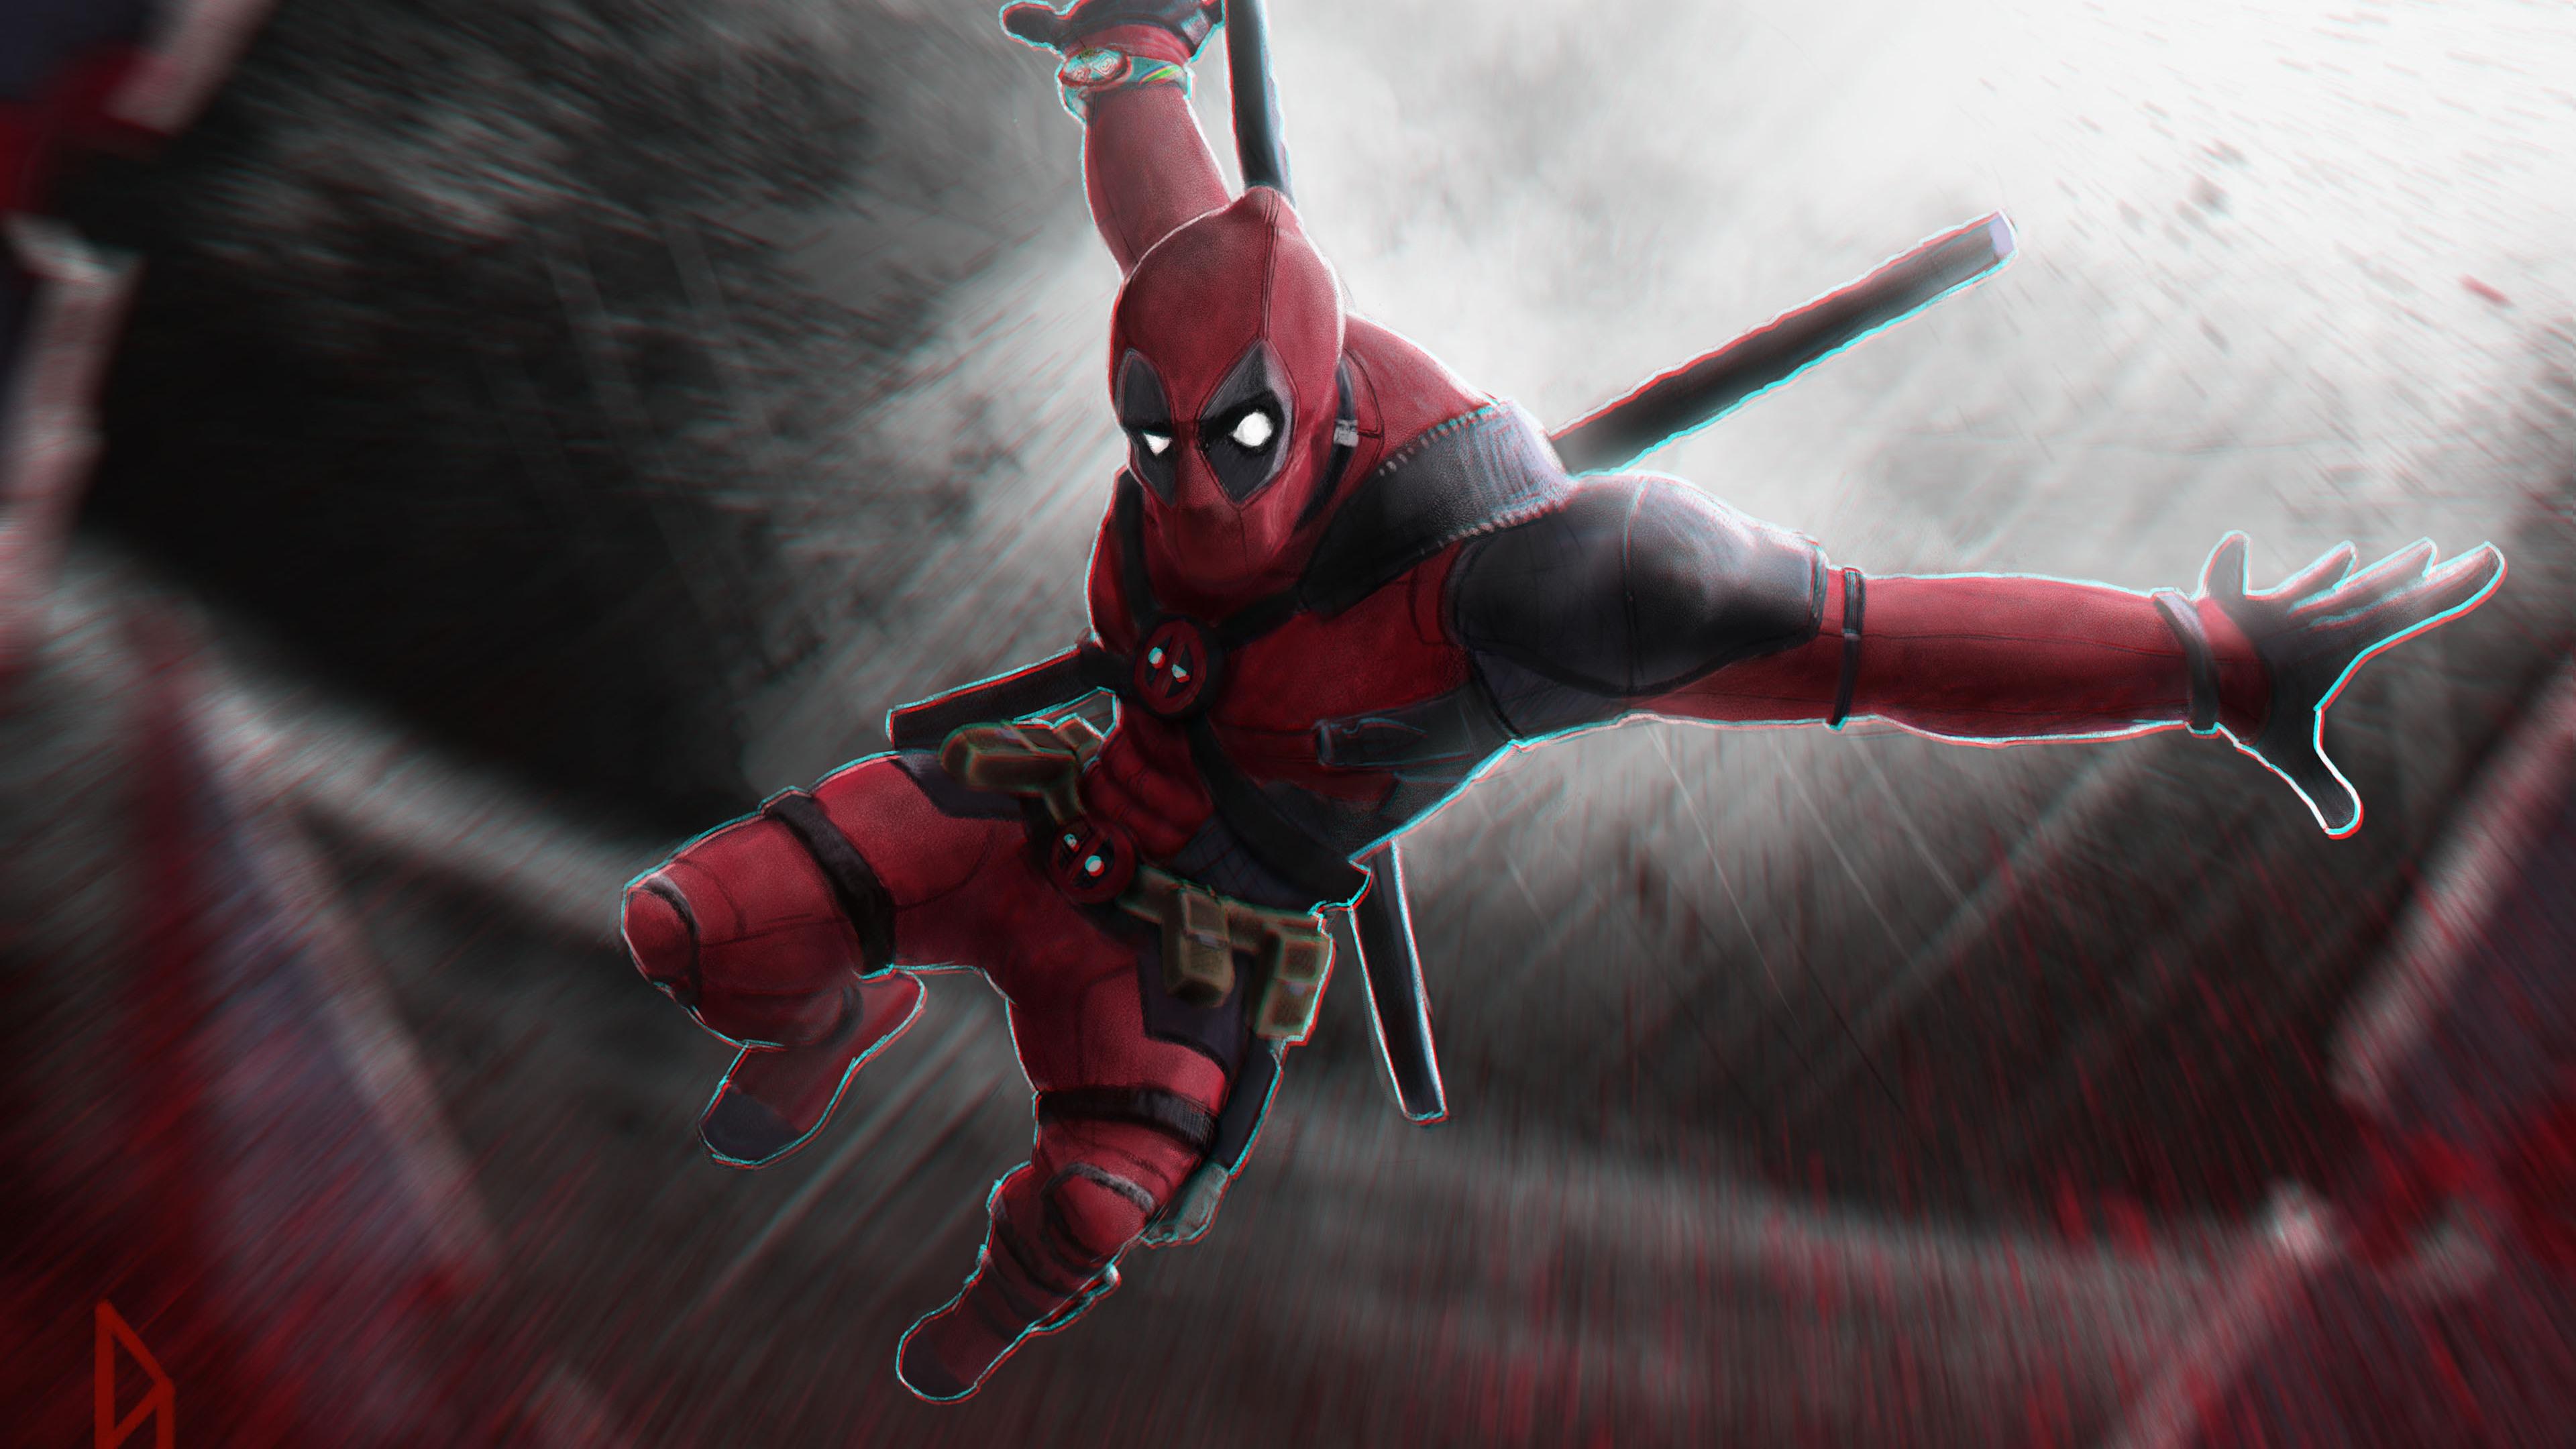 3840x2160 Deadpool 4k New Art 4k HD 4k ...